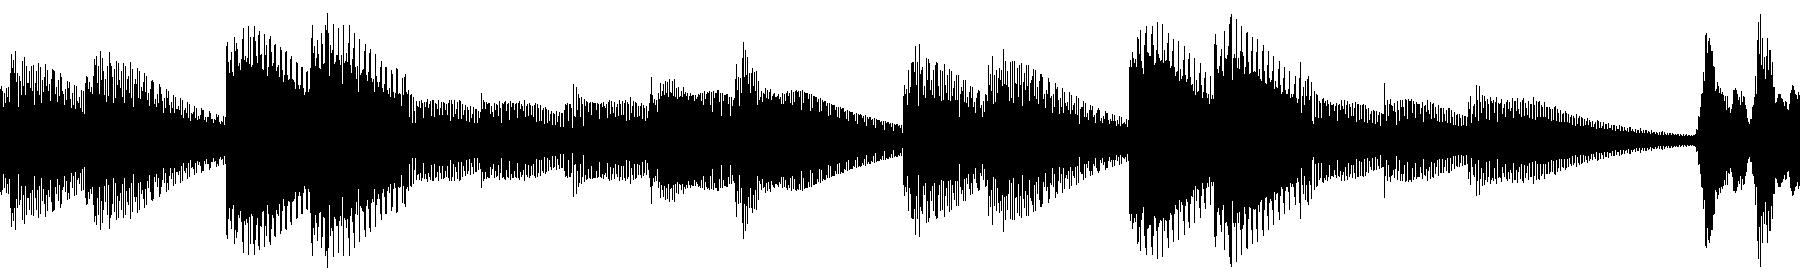 vedh melodyloop 015 fm 124bpm